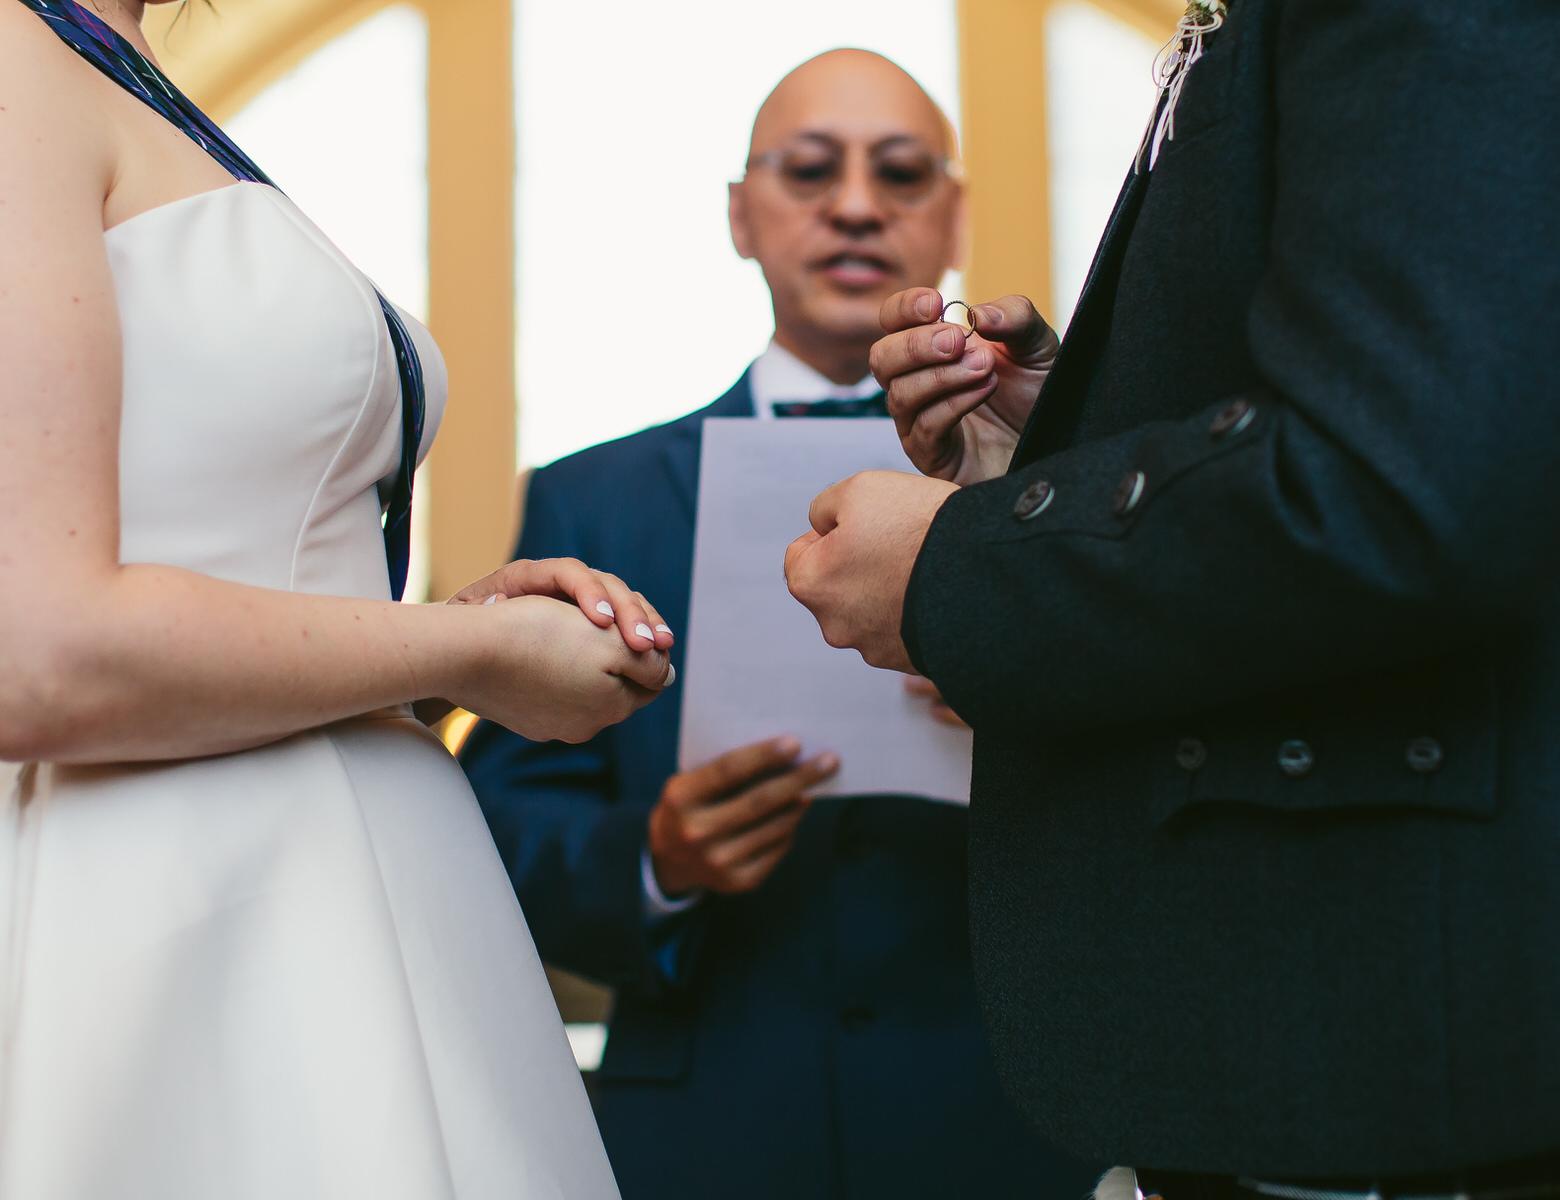 the_groom_holding_the_ring_tiny_house_photo_san_francisco_city_hall_wedding.jpg